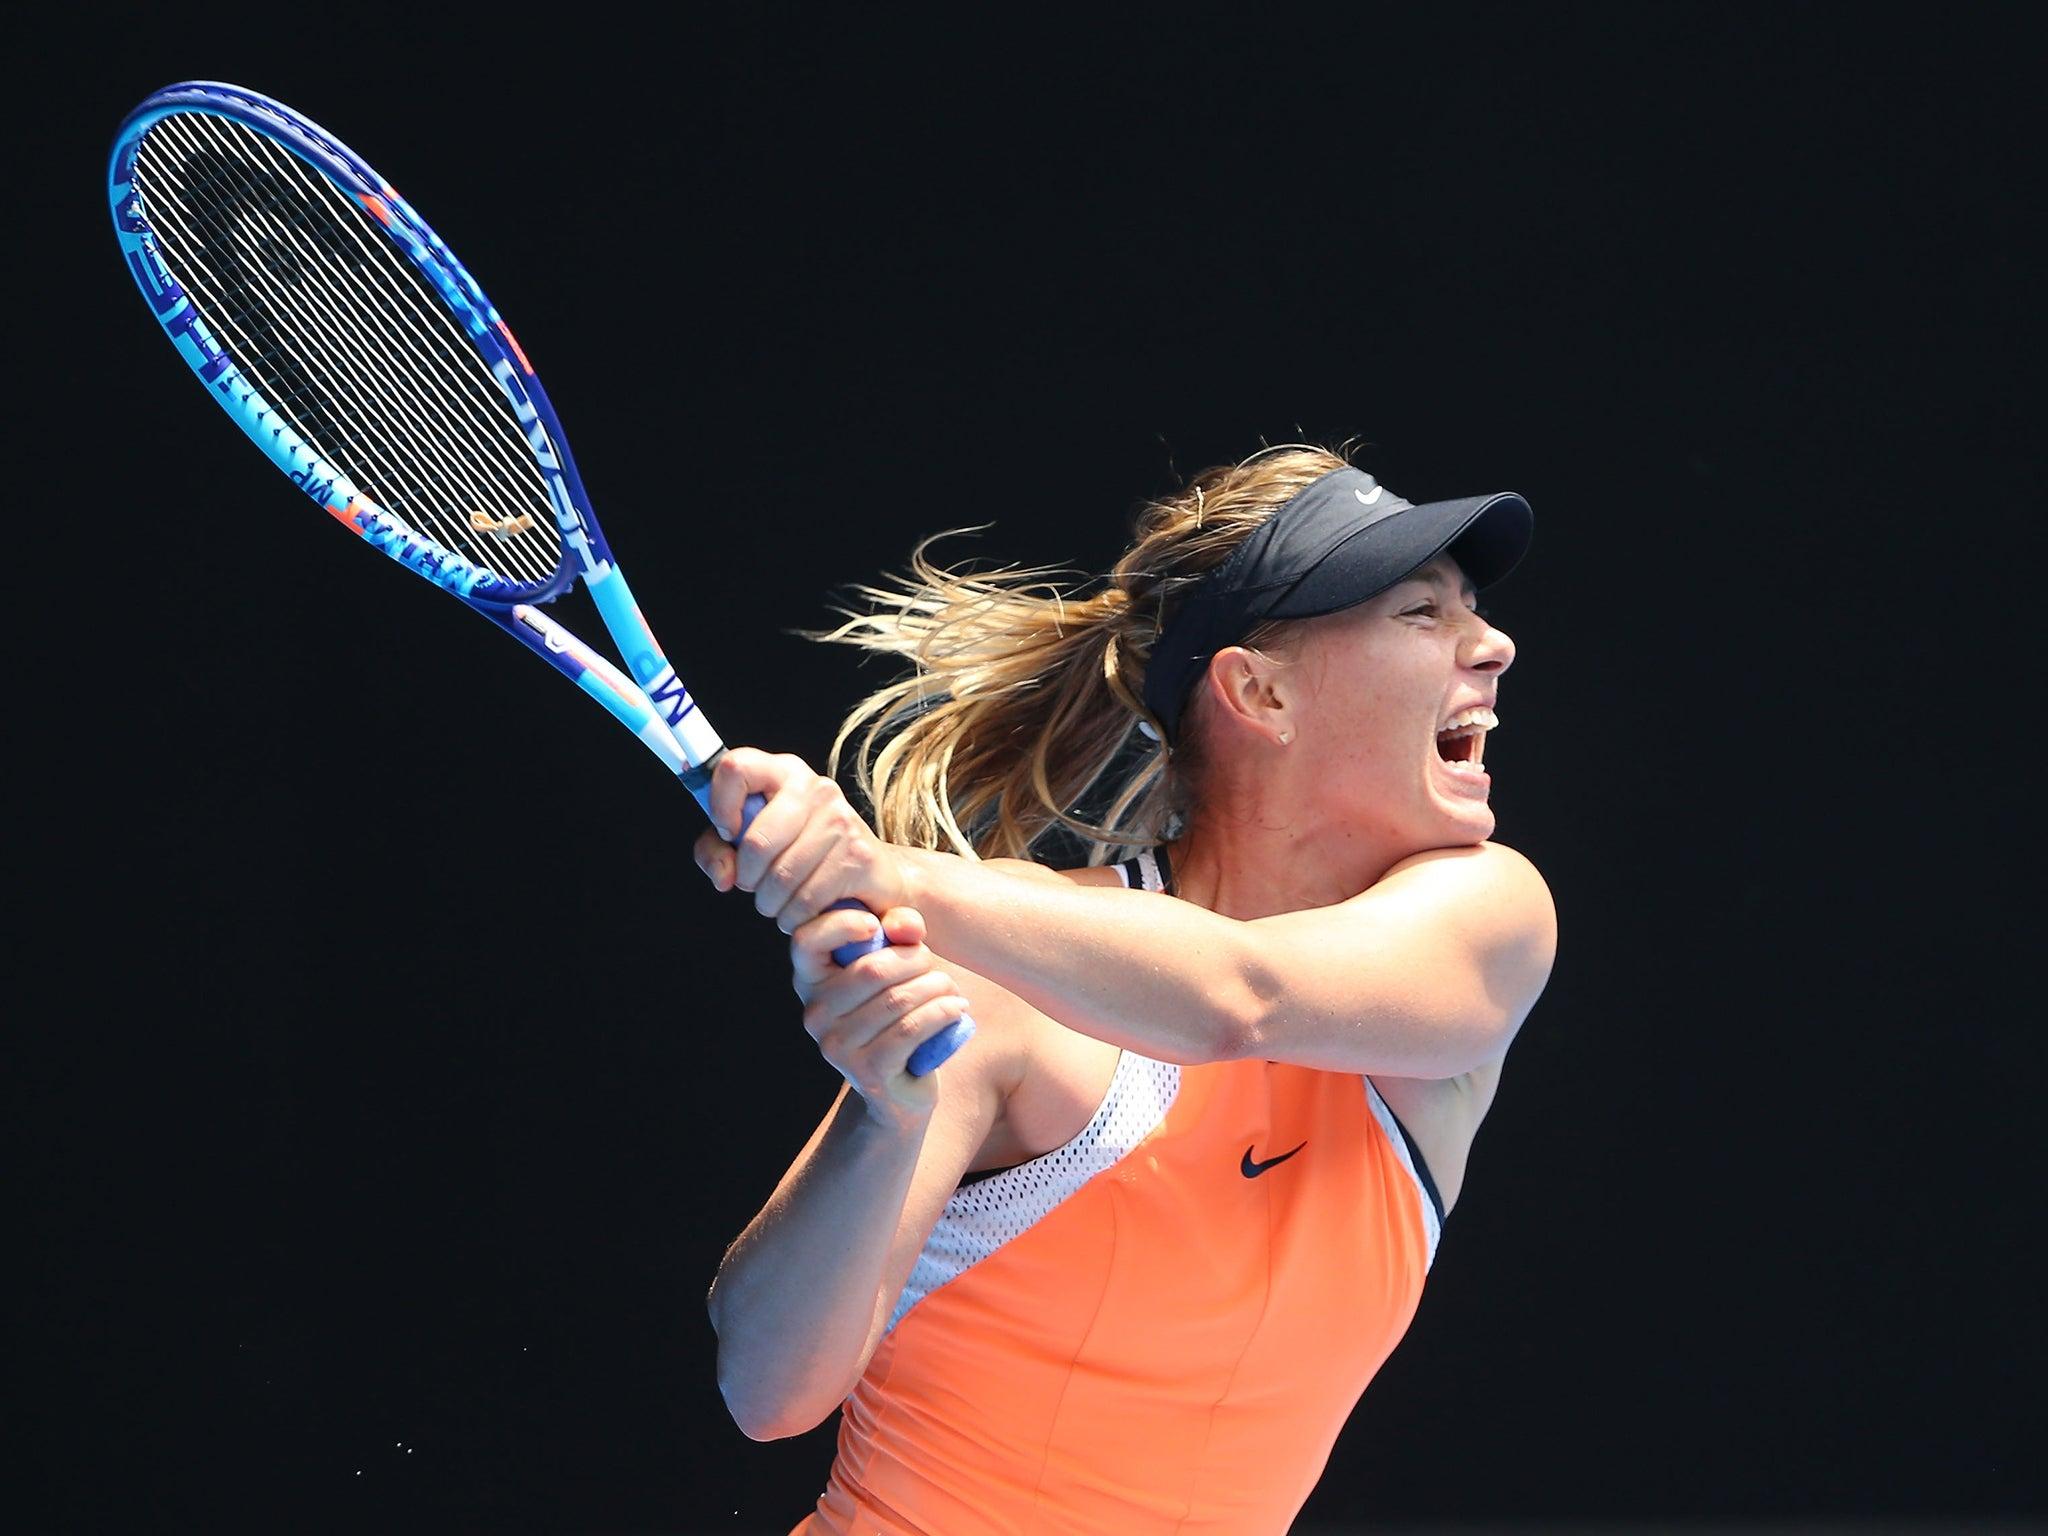 Maria Sharapova ban Tennis star facing one year suspension